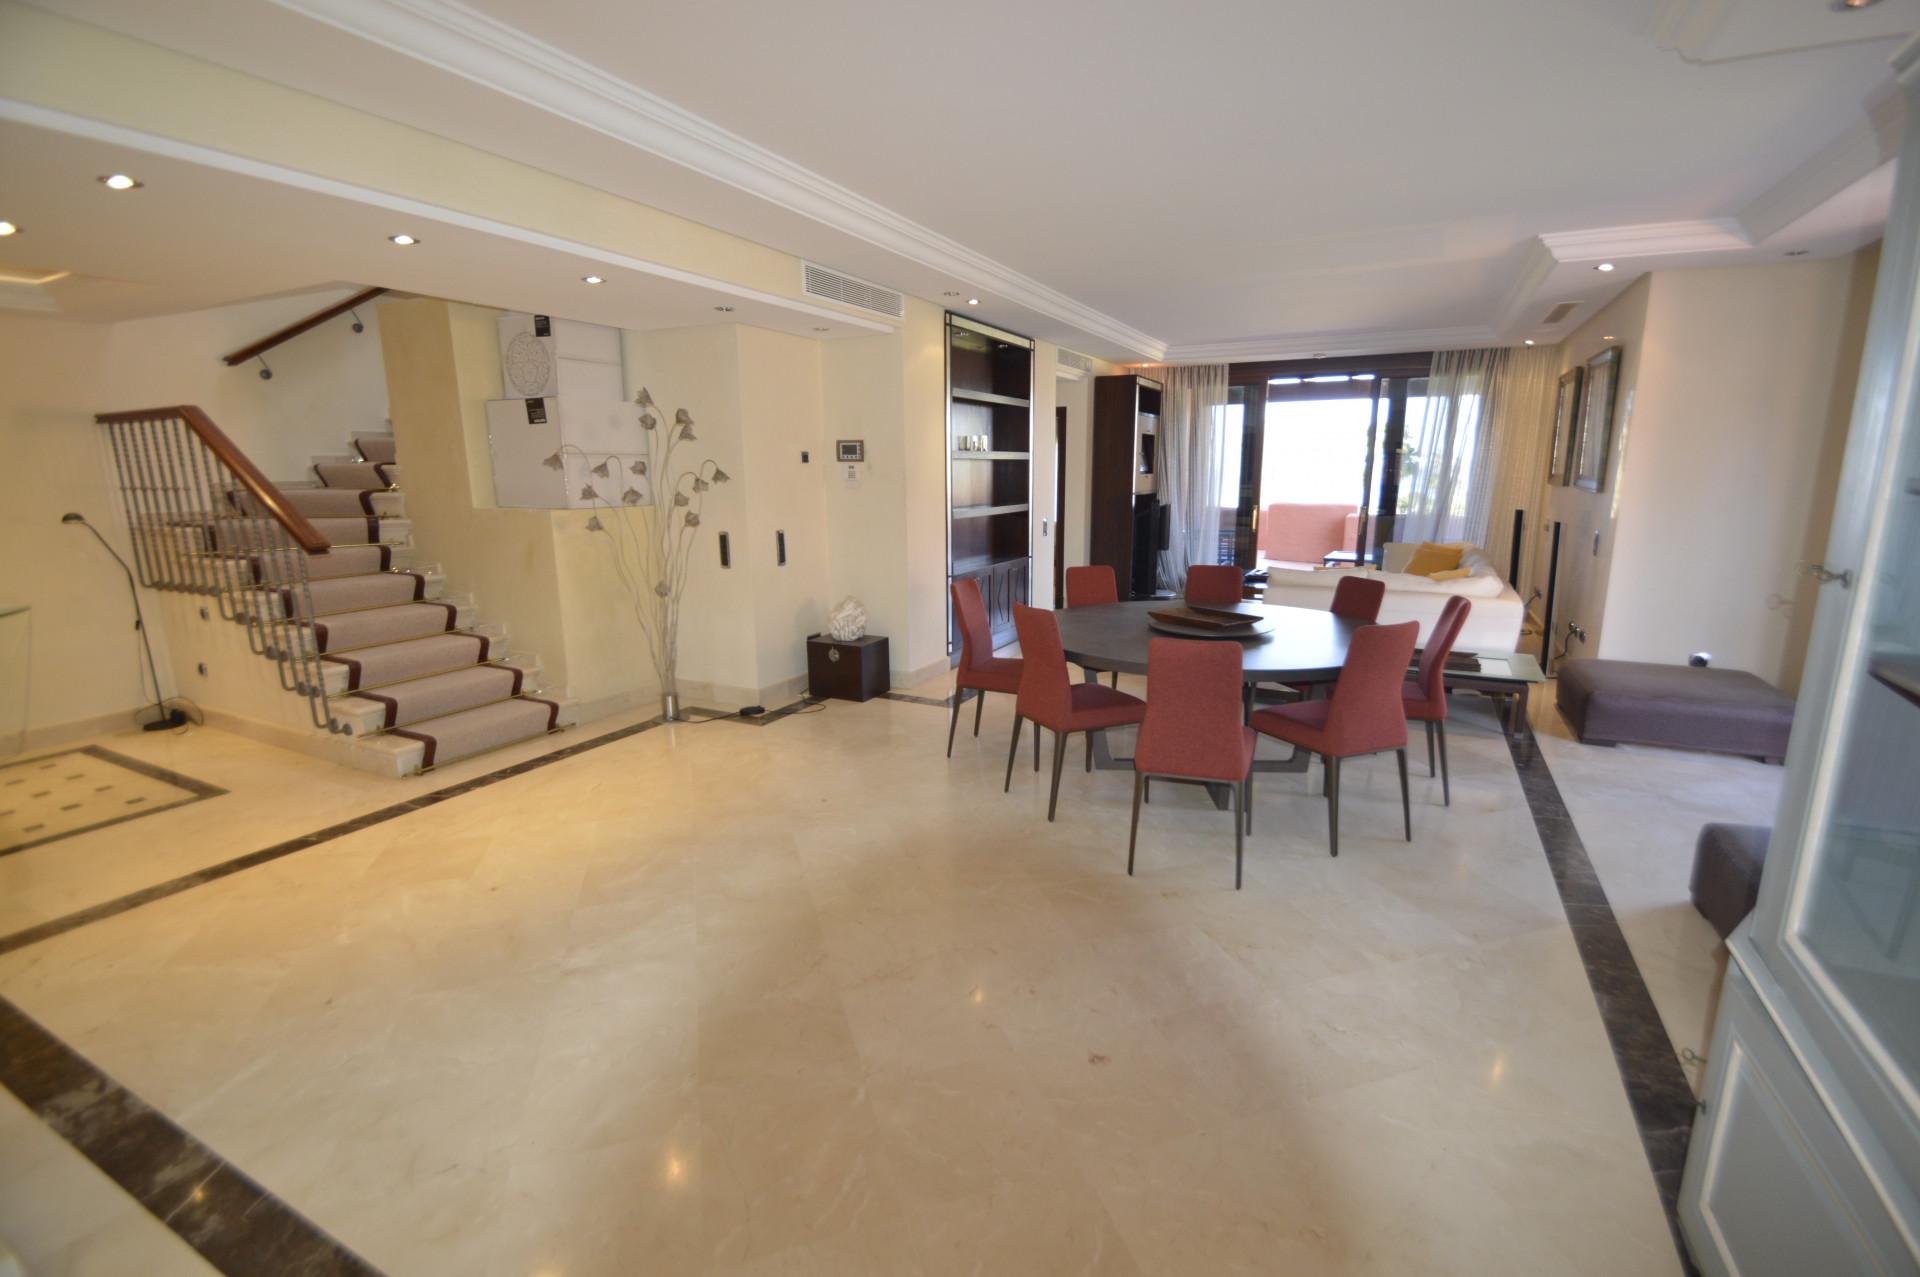 Atico Duplex en venta en Torre Bermeja, Estepona